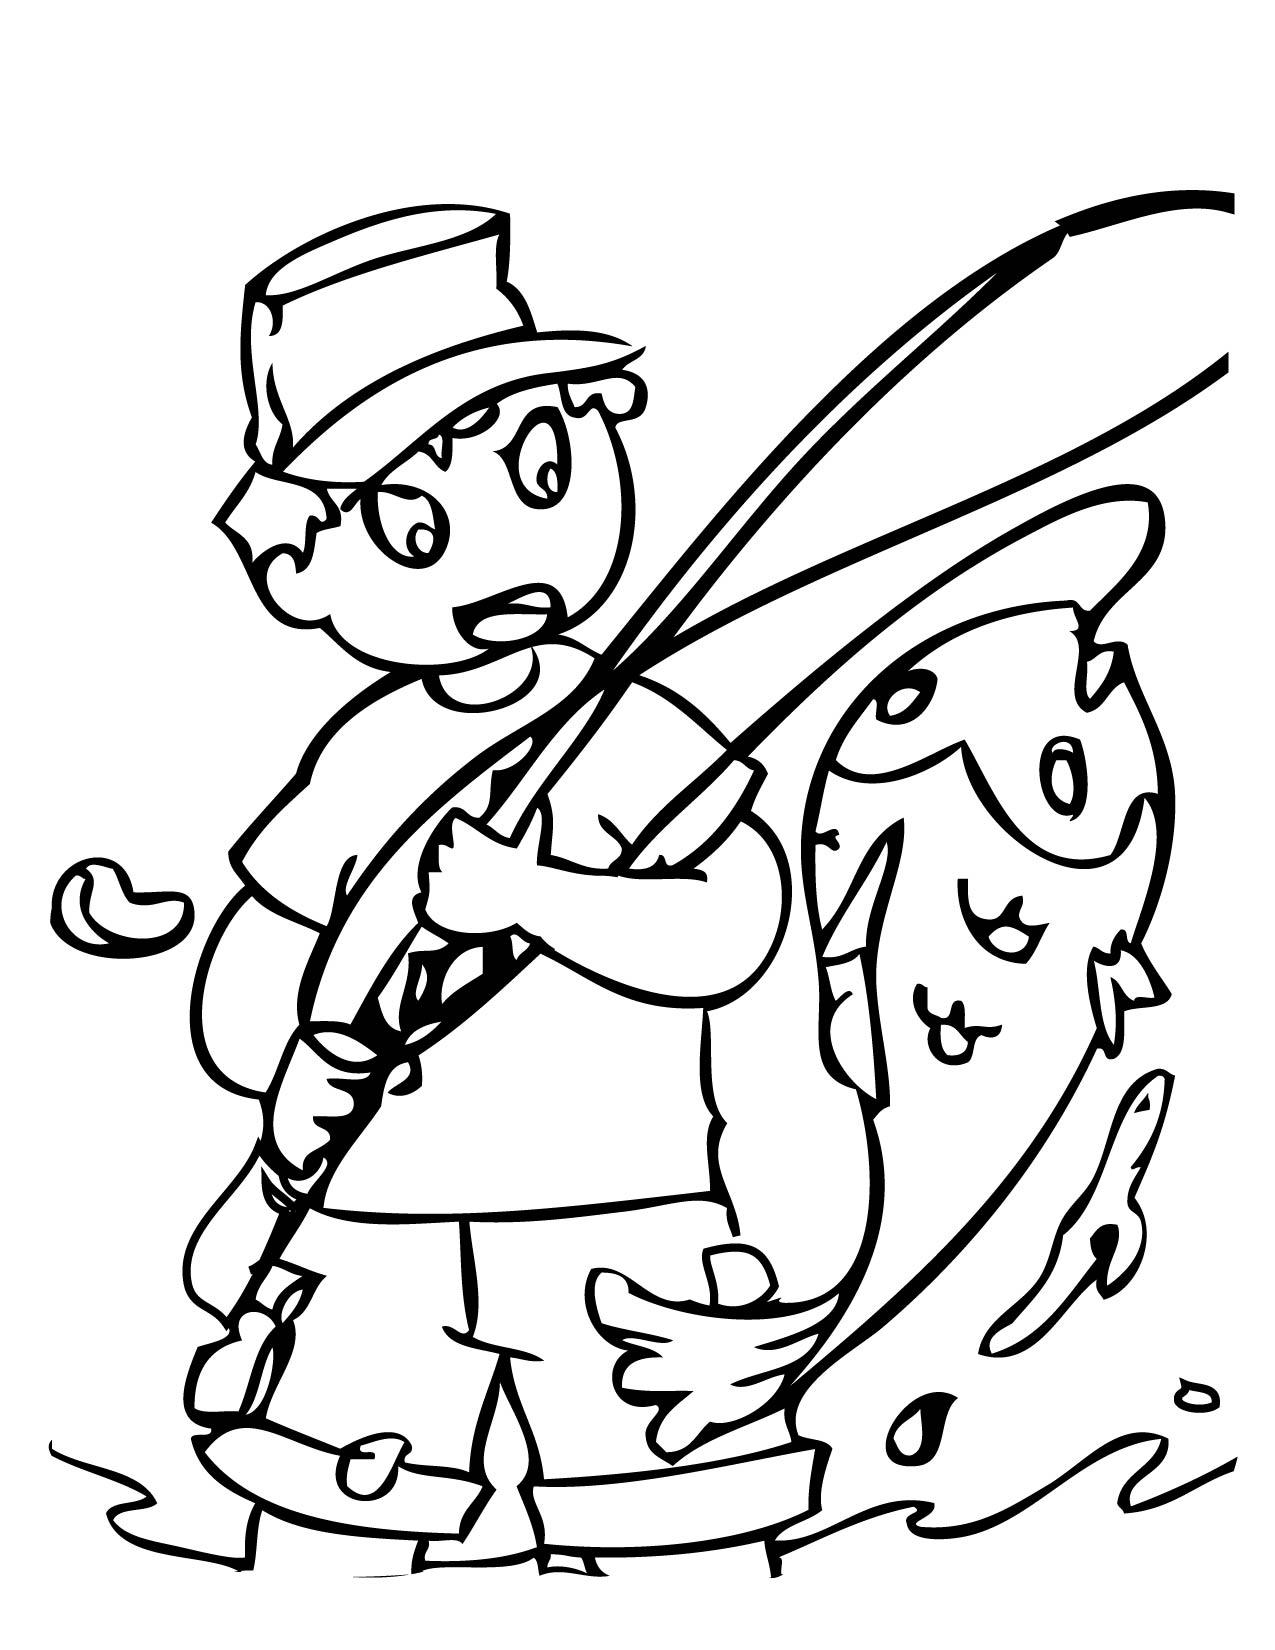 Fishing coloring #7, Download drawings